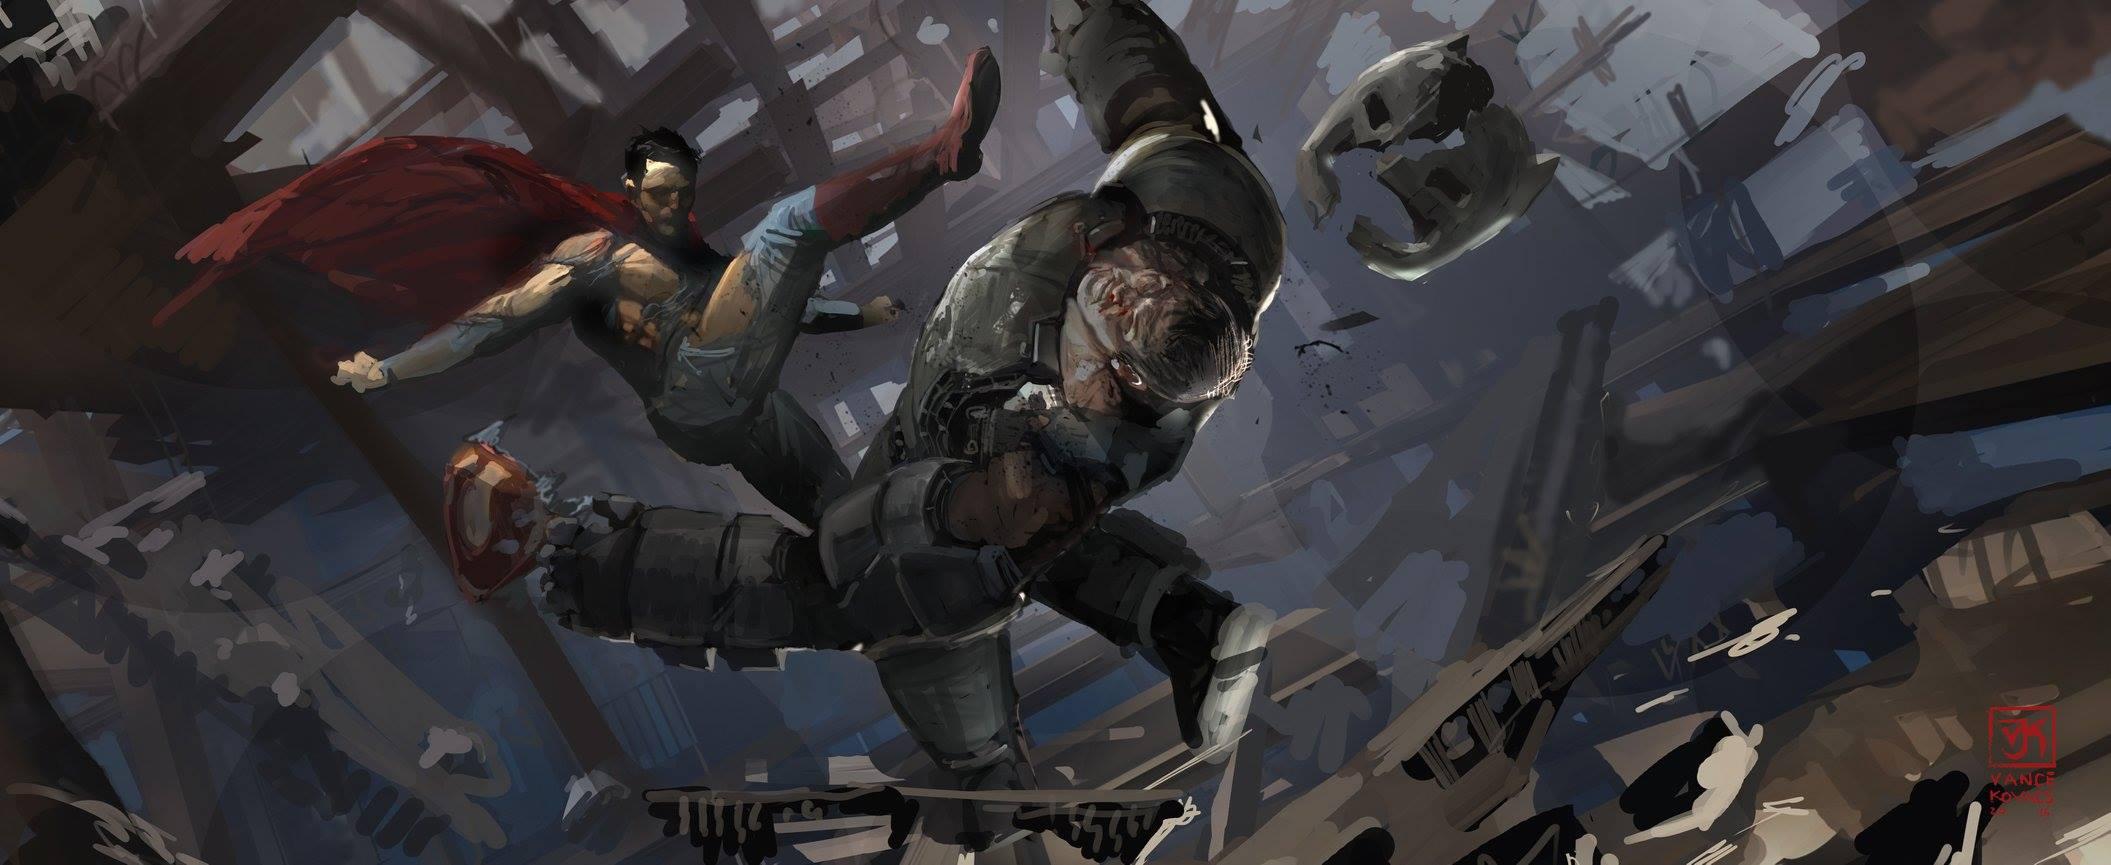 Batman V Superman Concept Art Shows Alternate Doomsday Designs